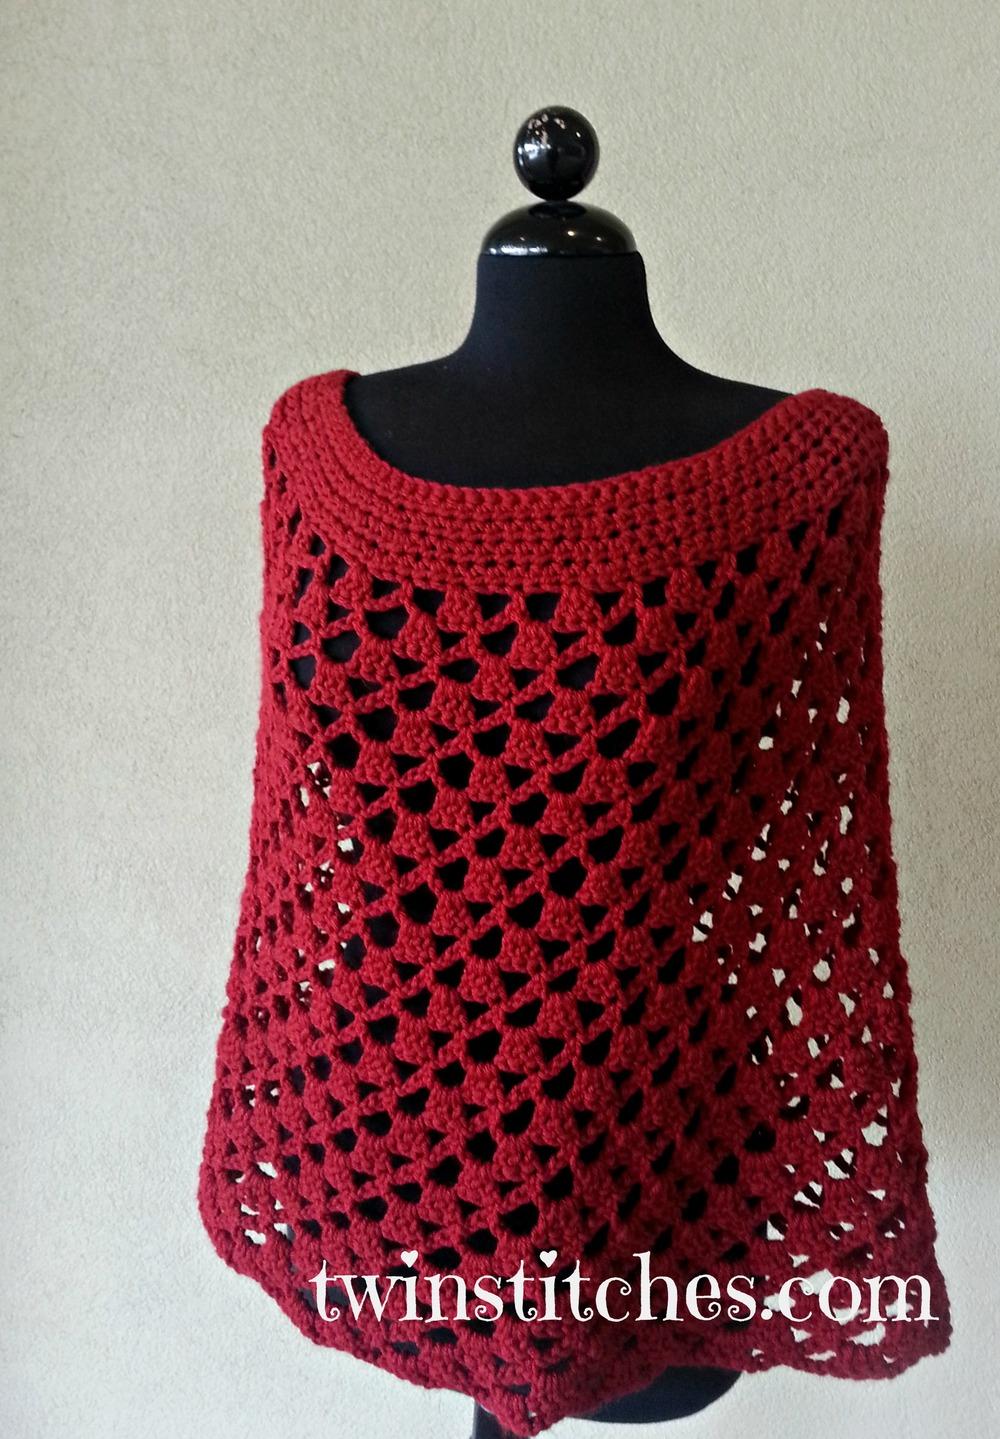 Free Crochet Pattern Mens Poncho : Scarlett Spiral Crochet Poncho AllFreeCrochet.com